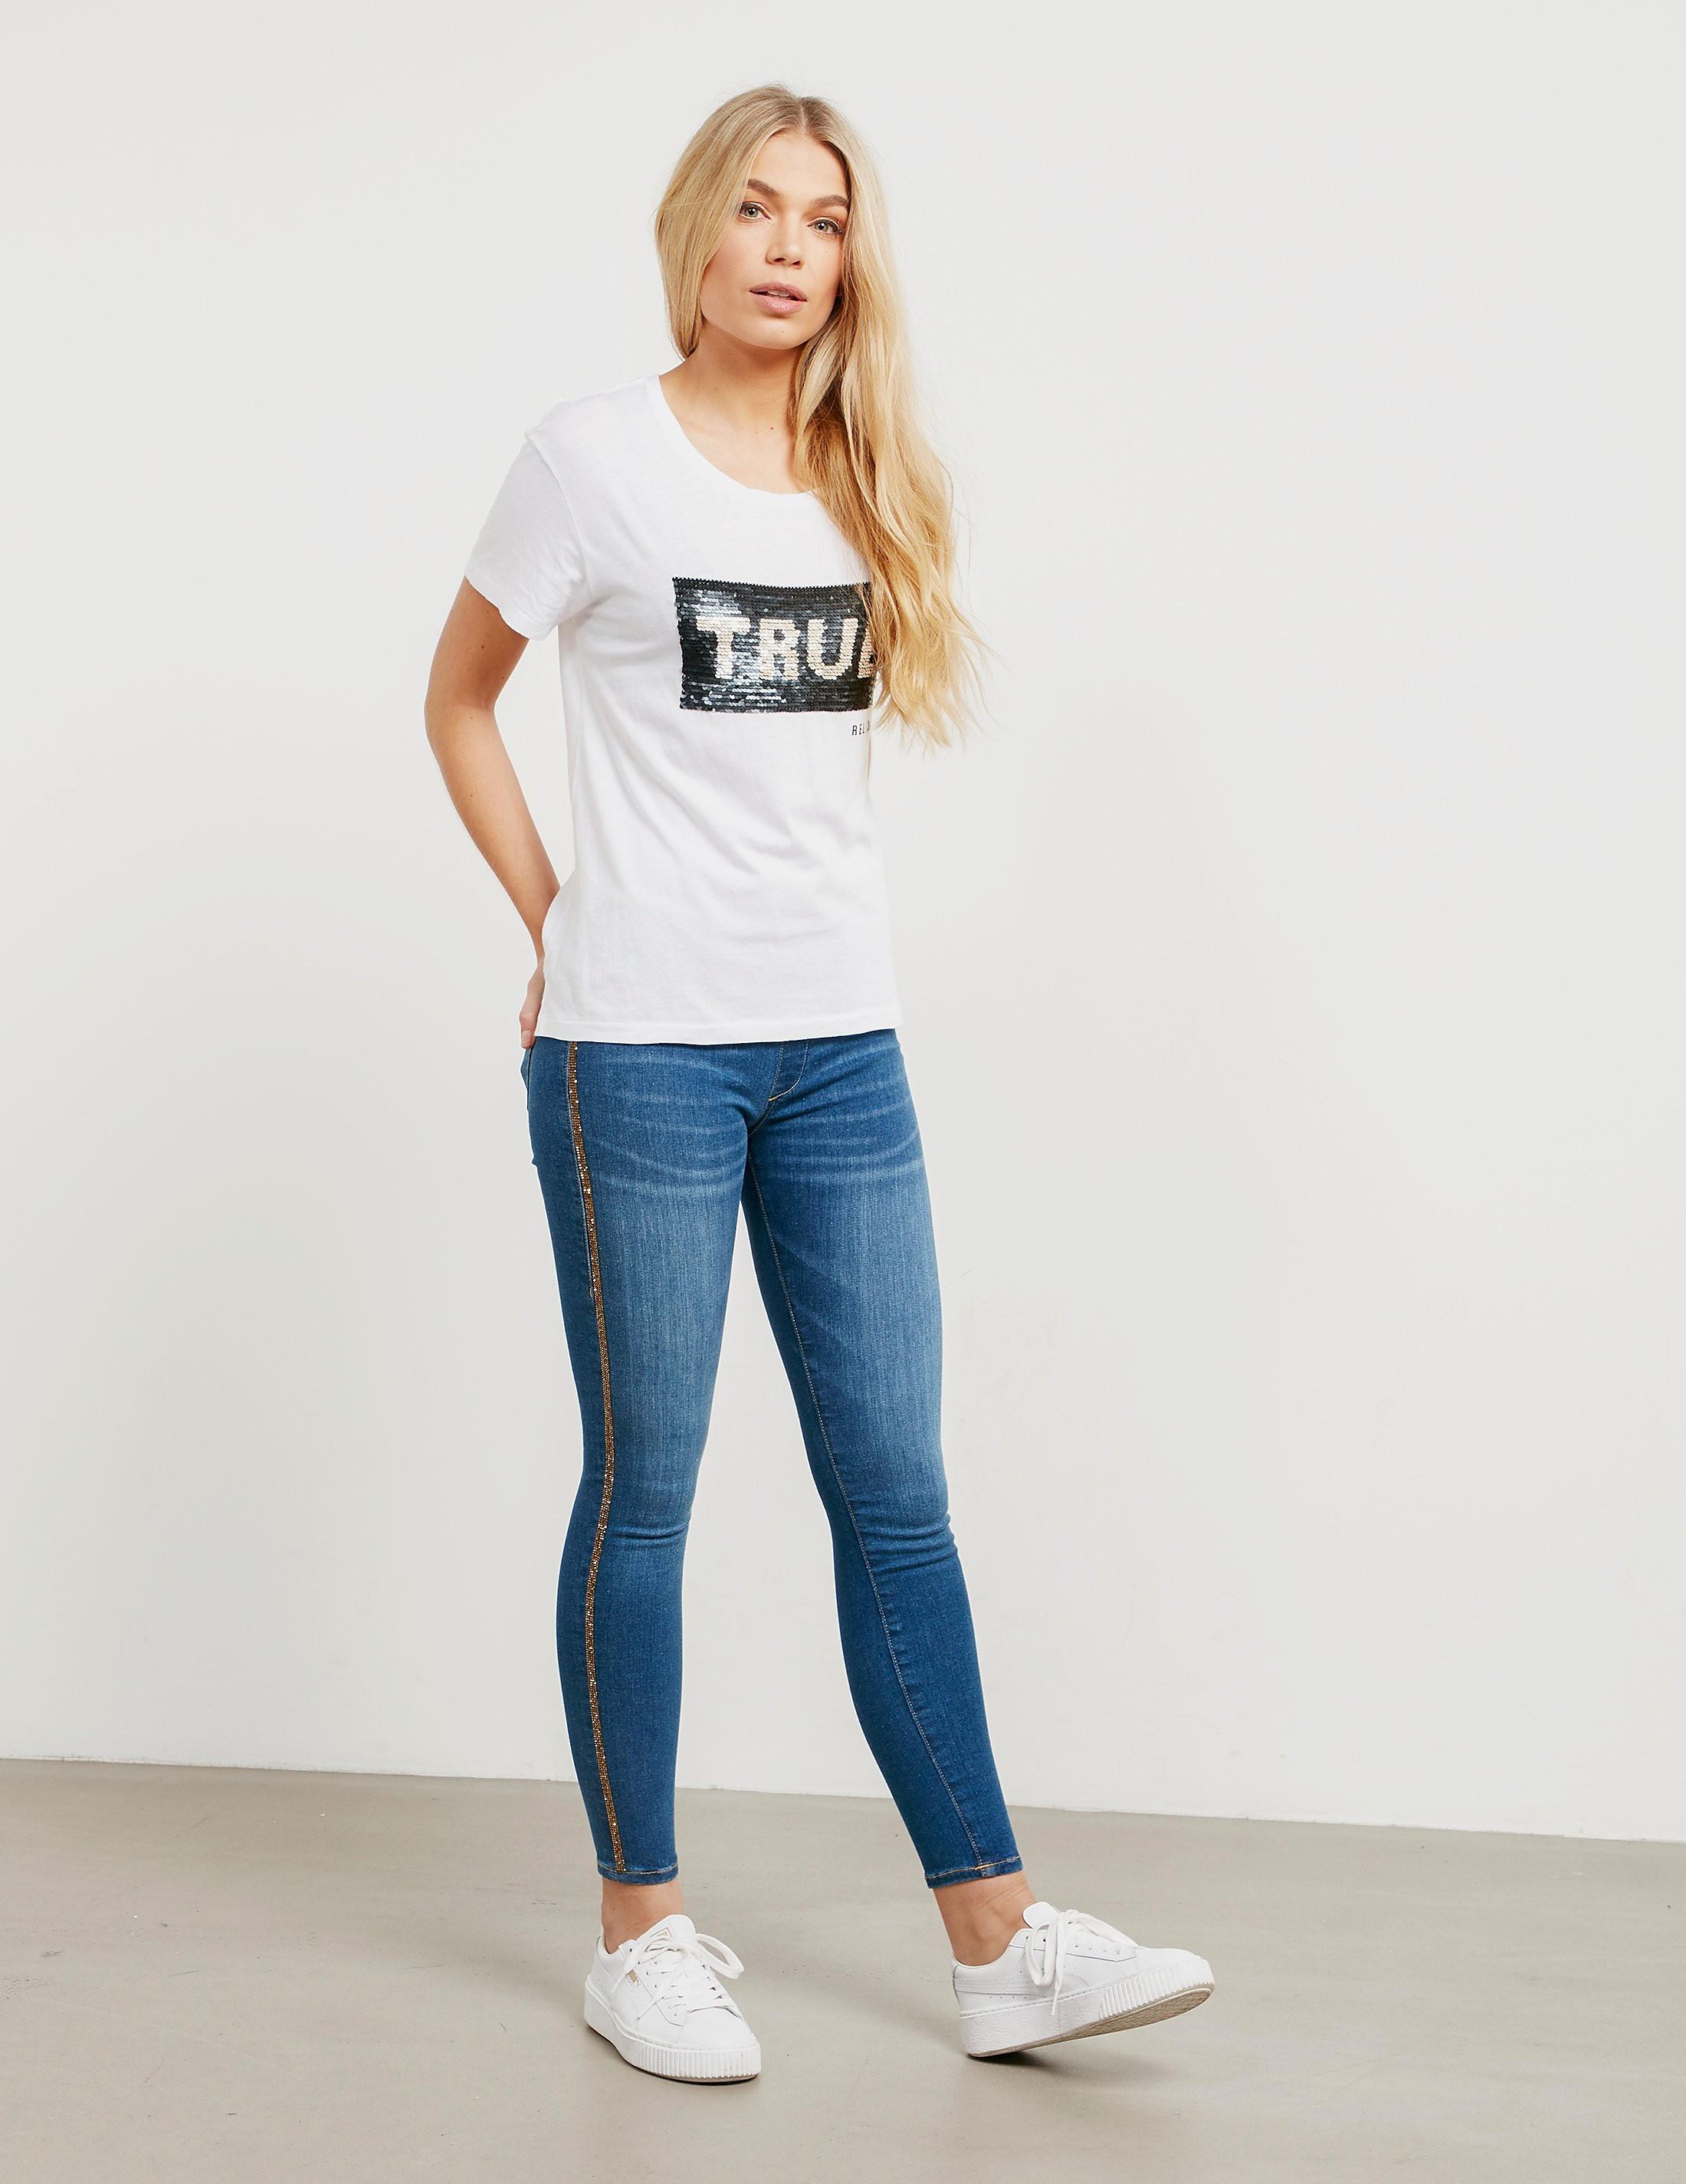 True Religion Rhinestone Skinny Jeans Leggings